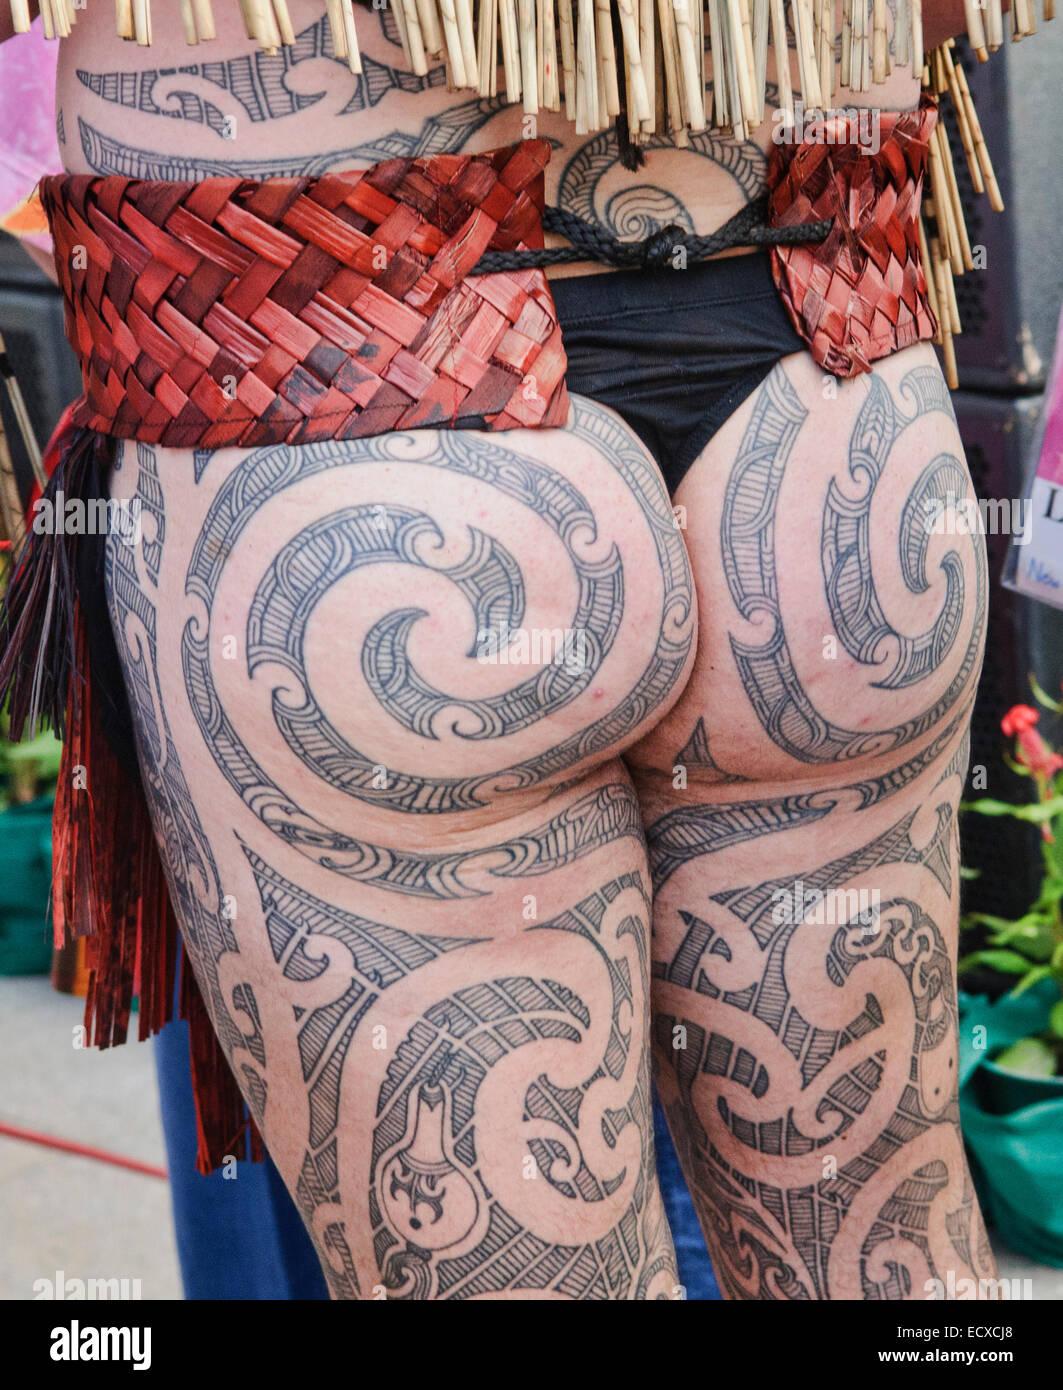 7 Wonders Of The World Tattoo